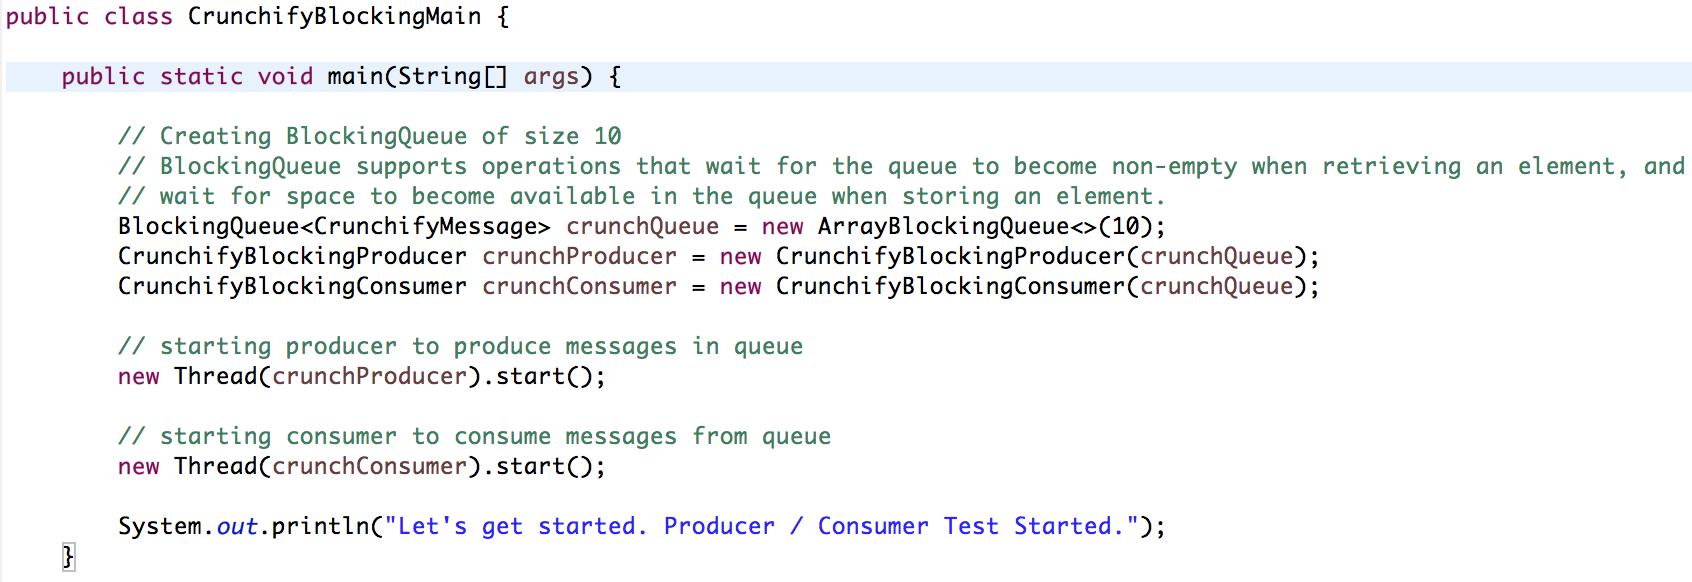 Java blocking queue example crunchify tips crunchify articles java blocking queue example crunchify tips baditri Images